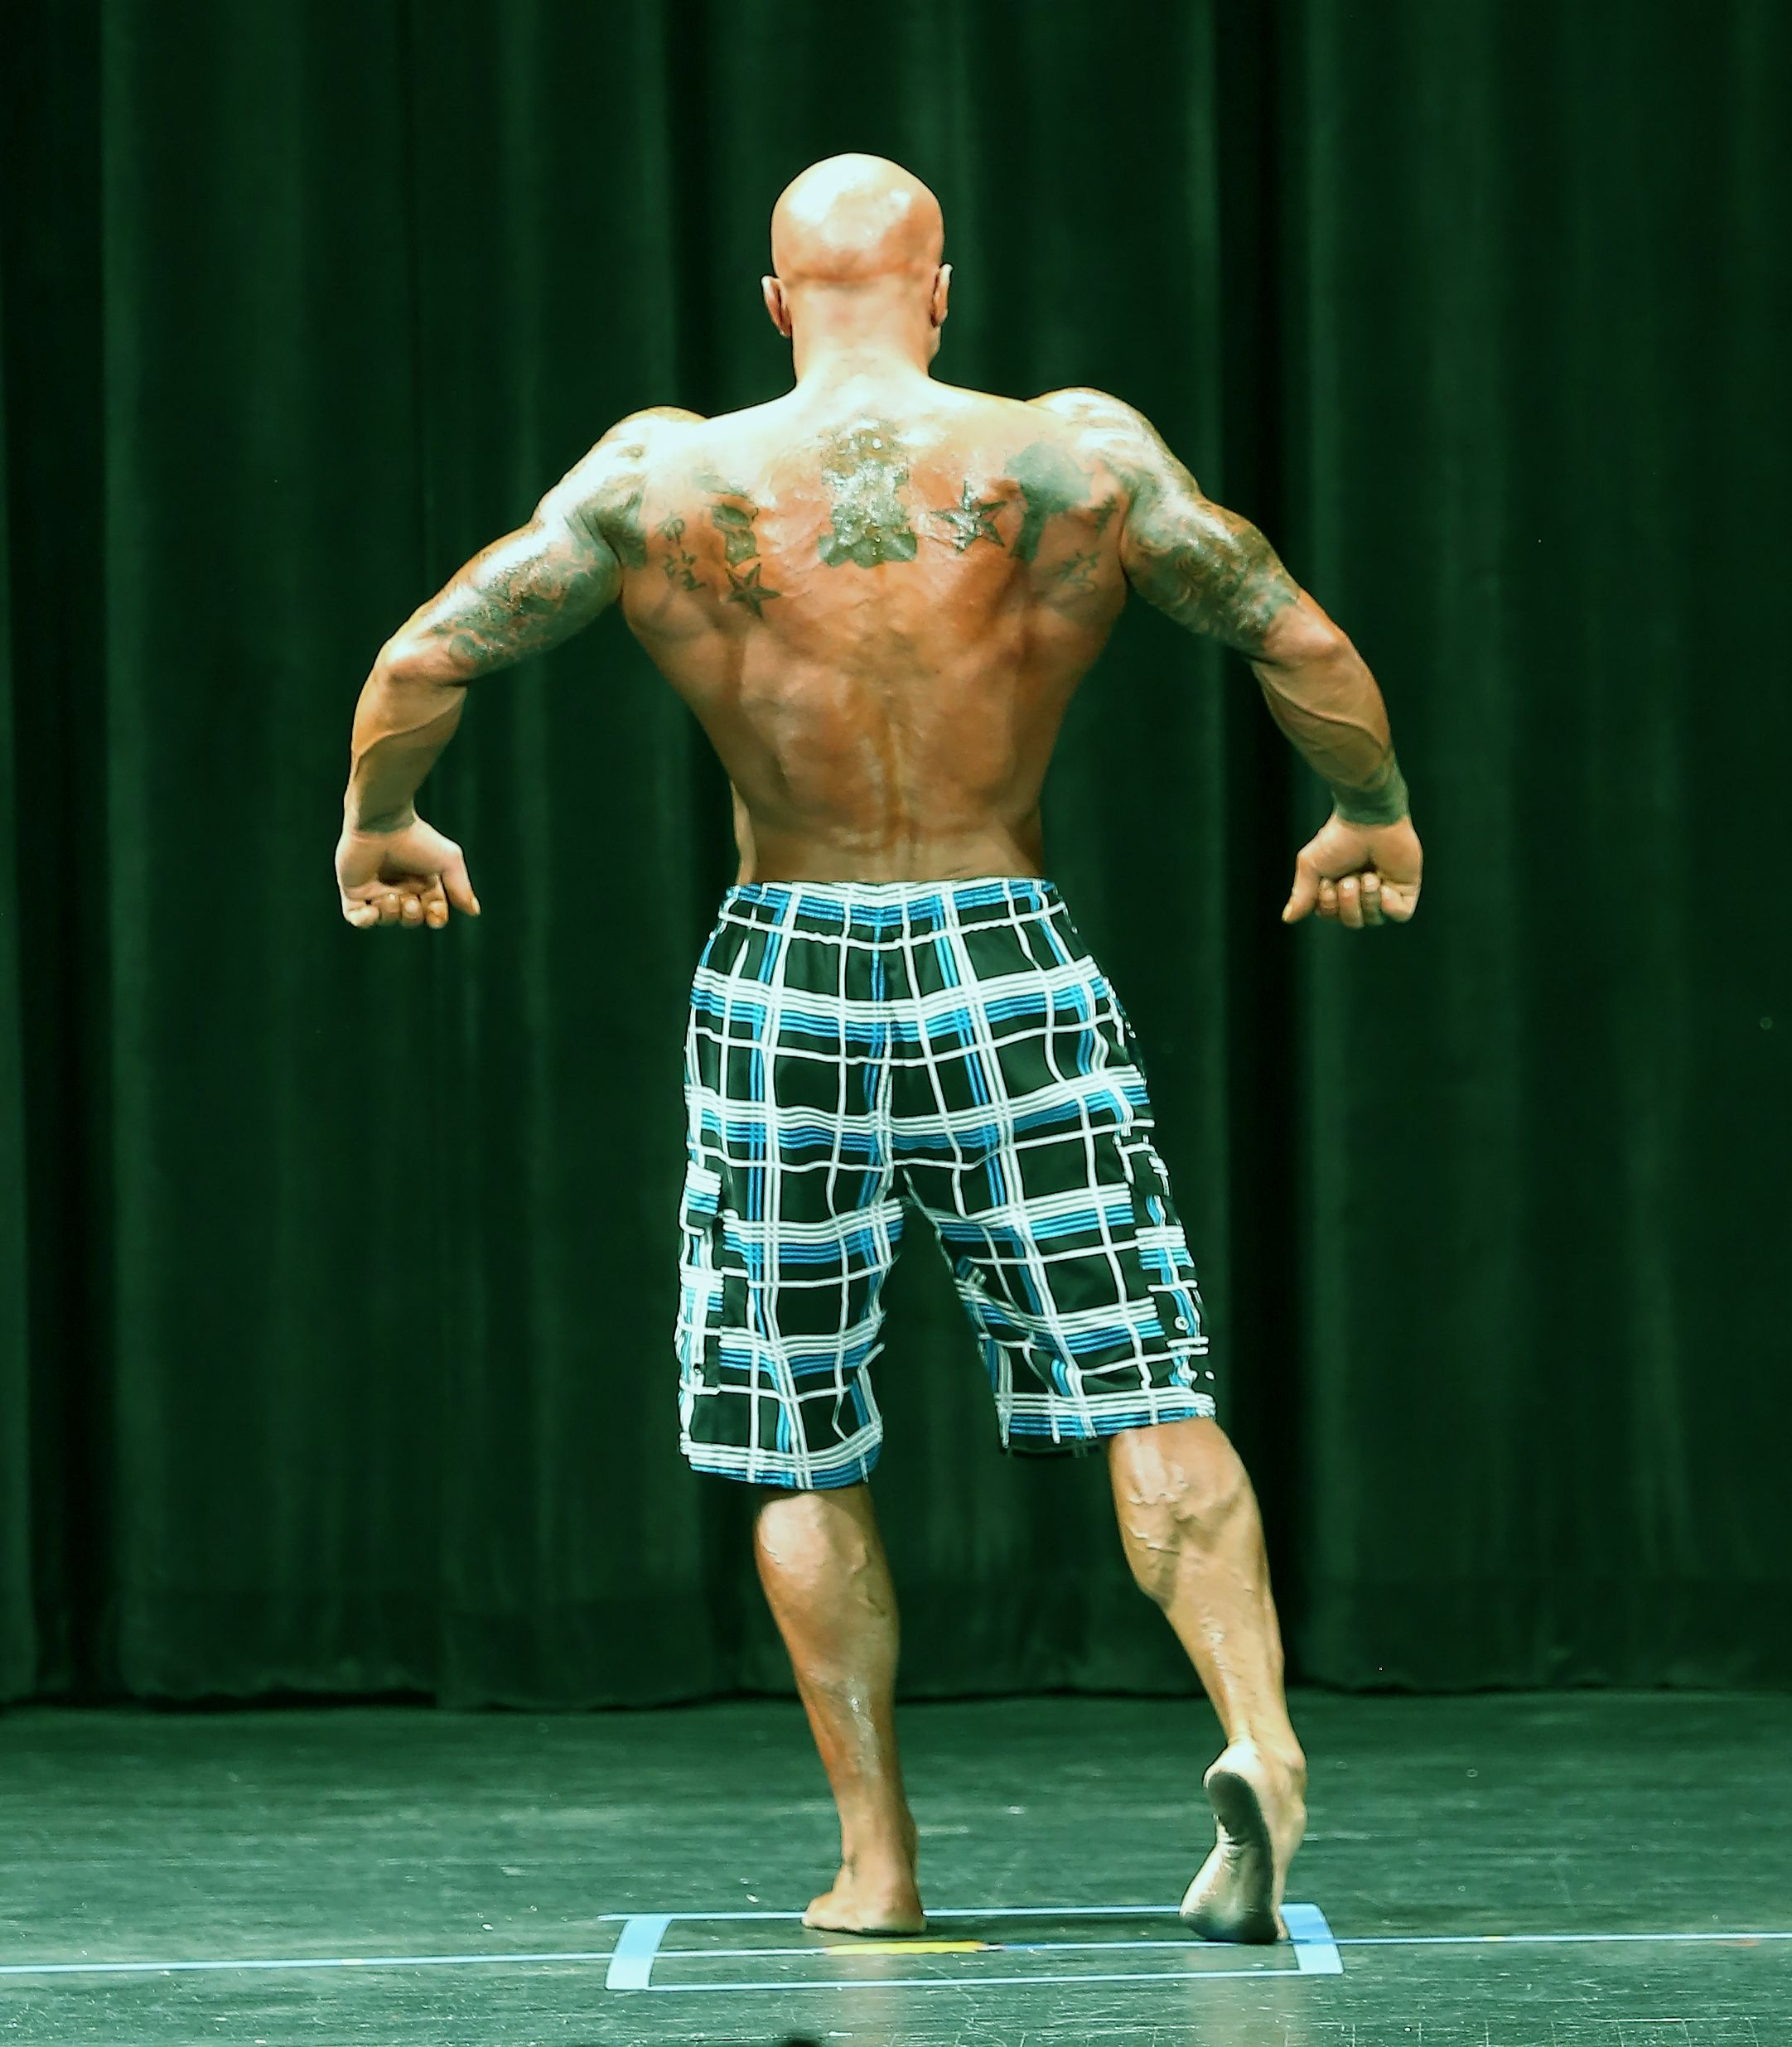 2015 NPC Bev Francis Atlantic States John Joseph Quinlan Men's Physique on Stage #JohnQuinlan